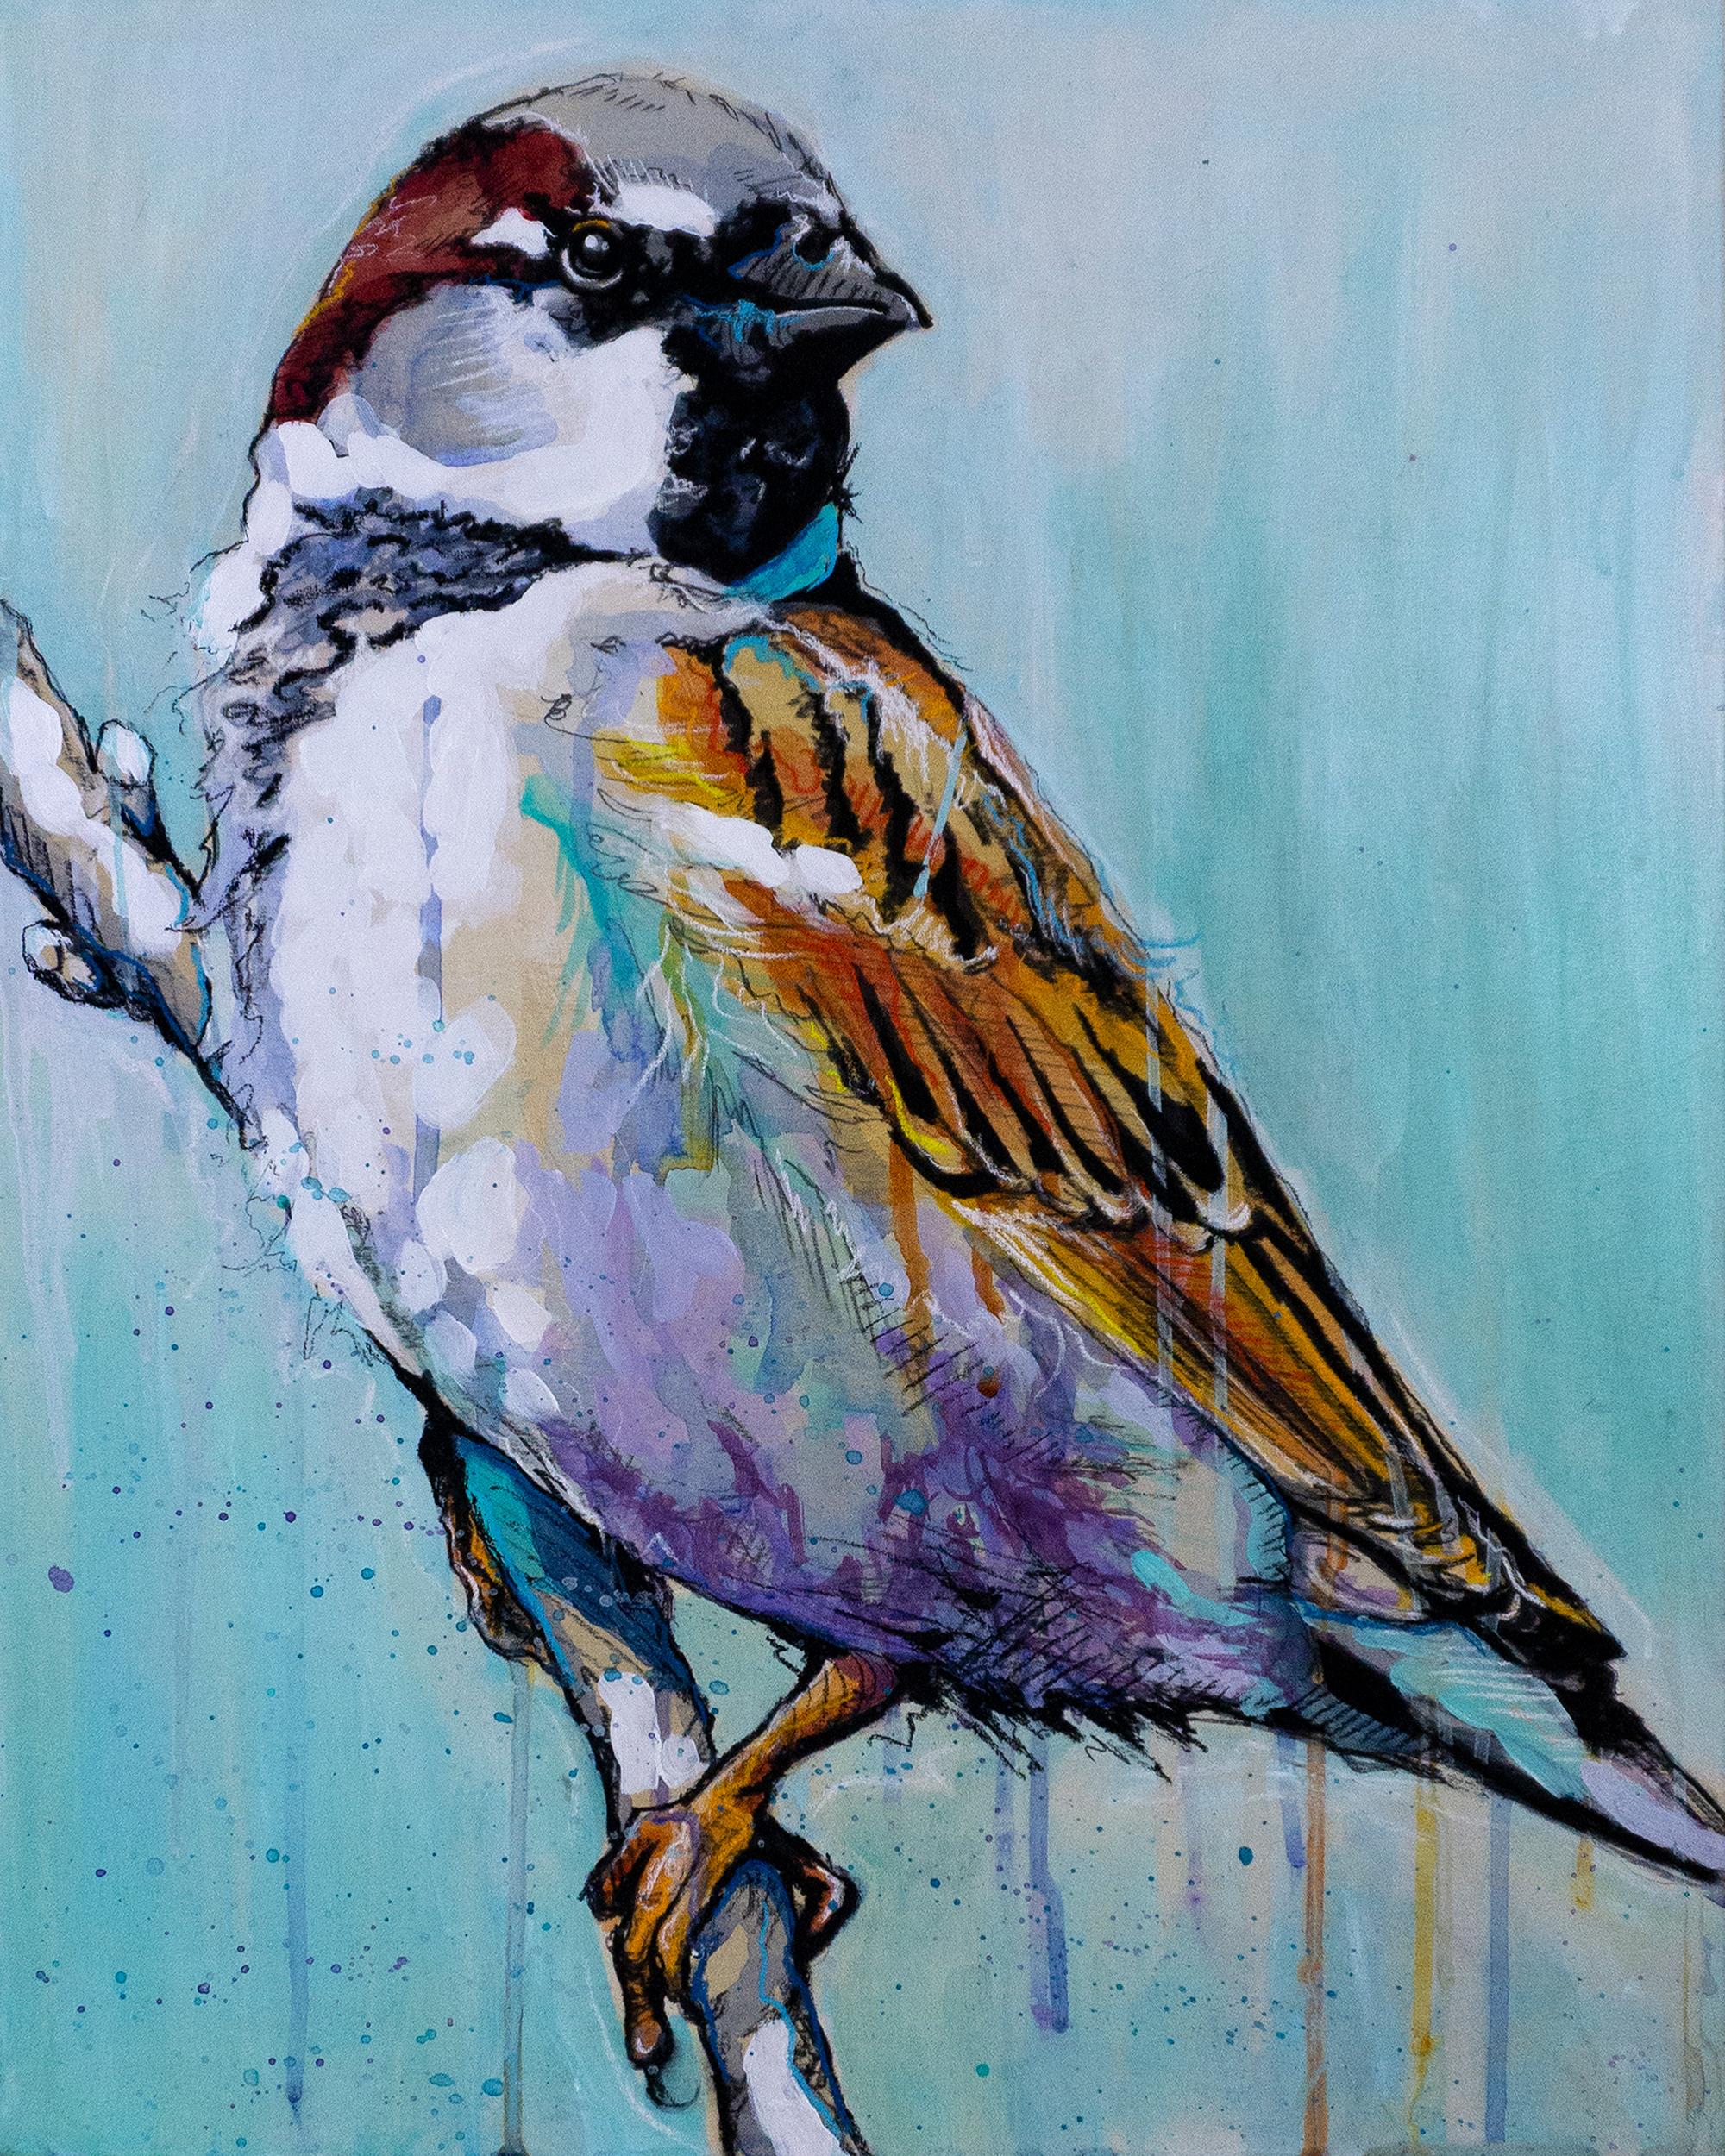 Male house sparrow painting final original ybn1di